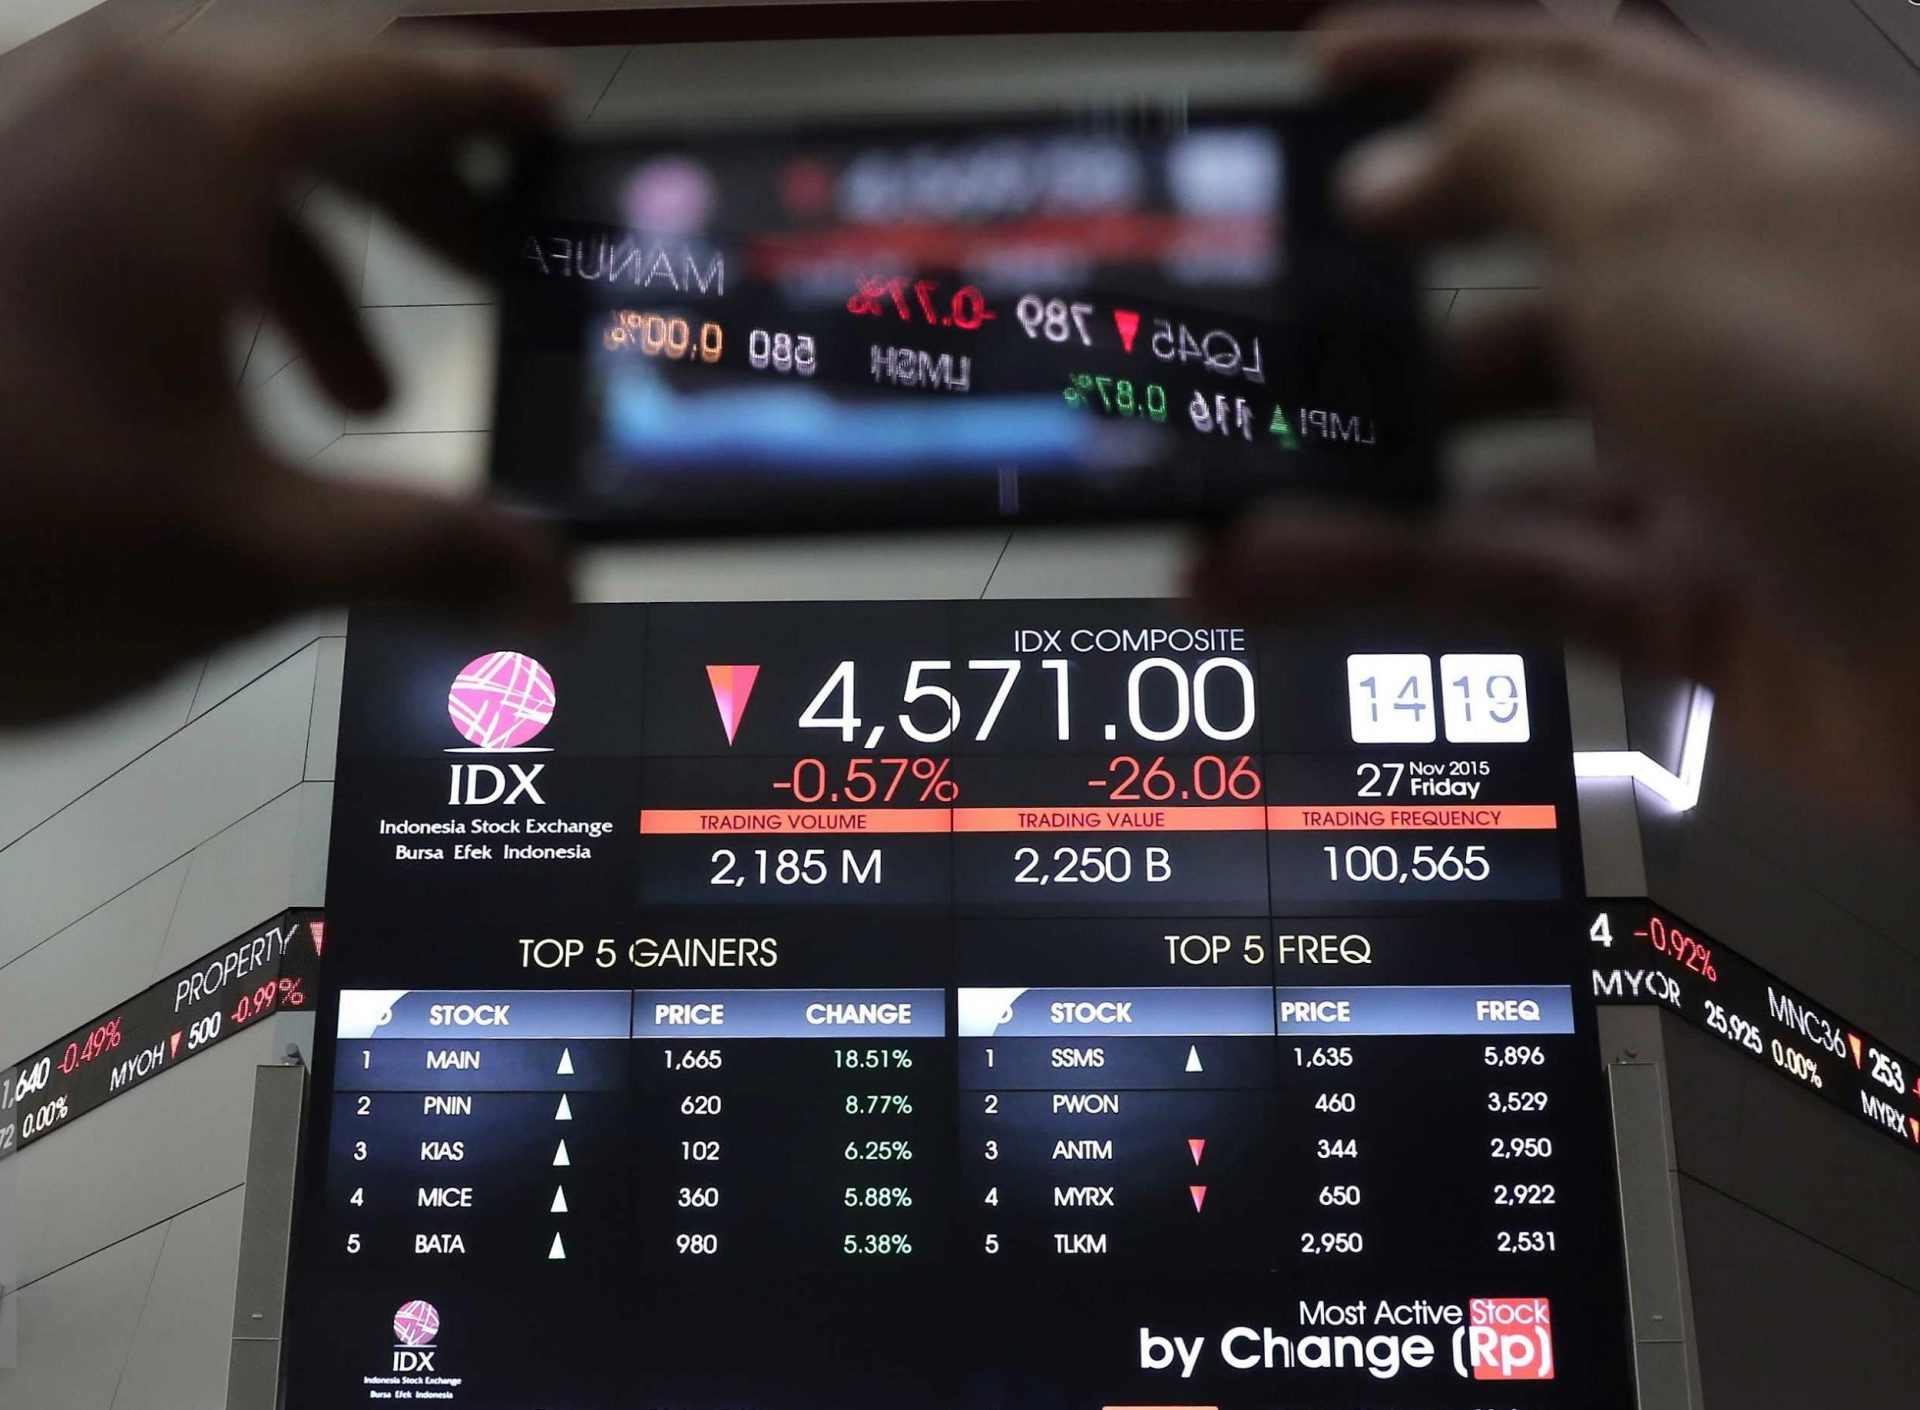 bermain saham - investasi saham untuk PNS - jenis-jenis reksa dana